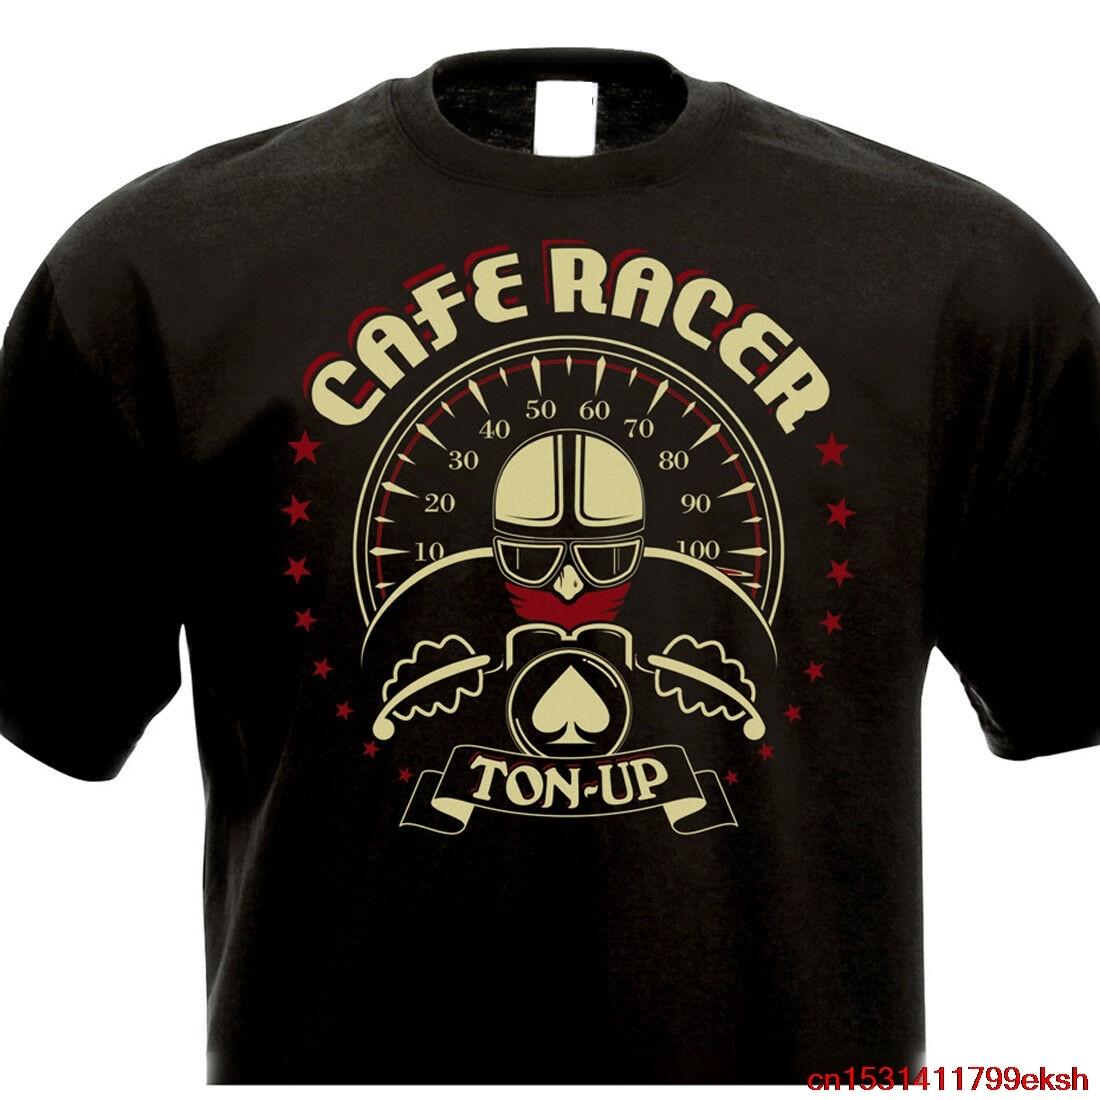 Camiseta de CAFE RACER TON-UP Vintage motocicleta BSA Triton